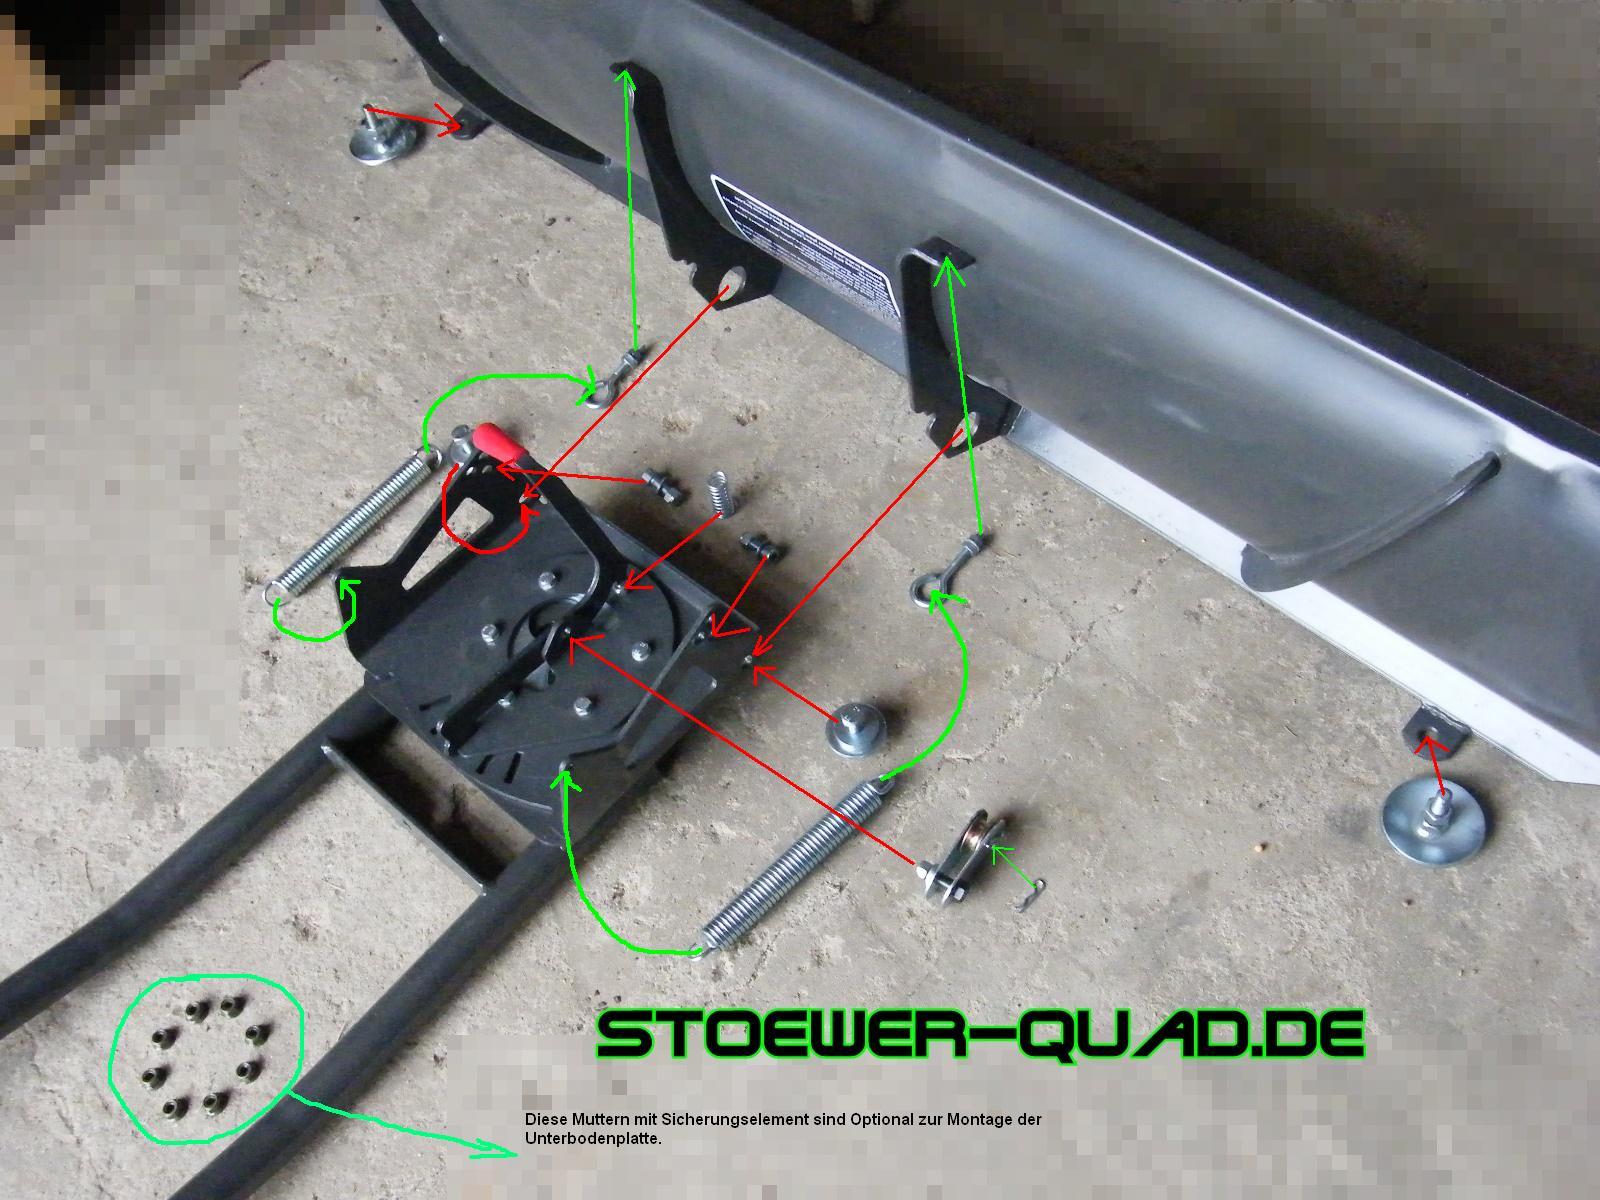 http://quad-schneeschild.quadundmotorrad.de/Teile-009-schneeschild-ATV-700-Einbau.JPG